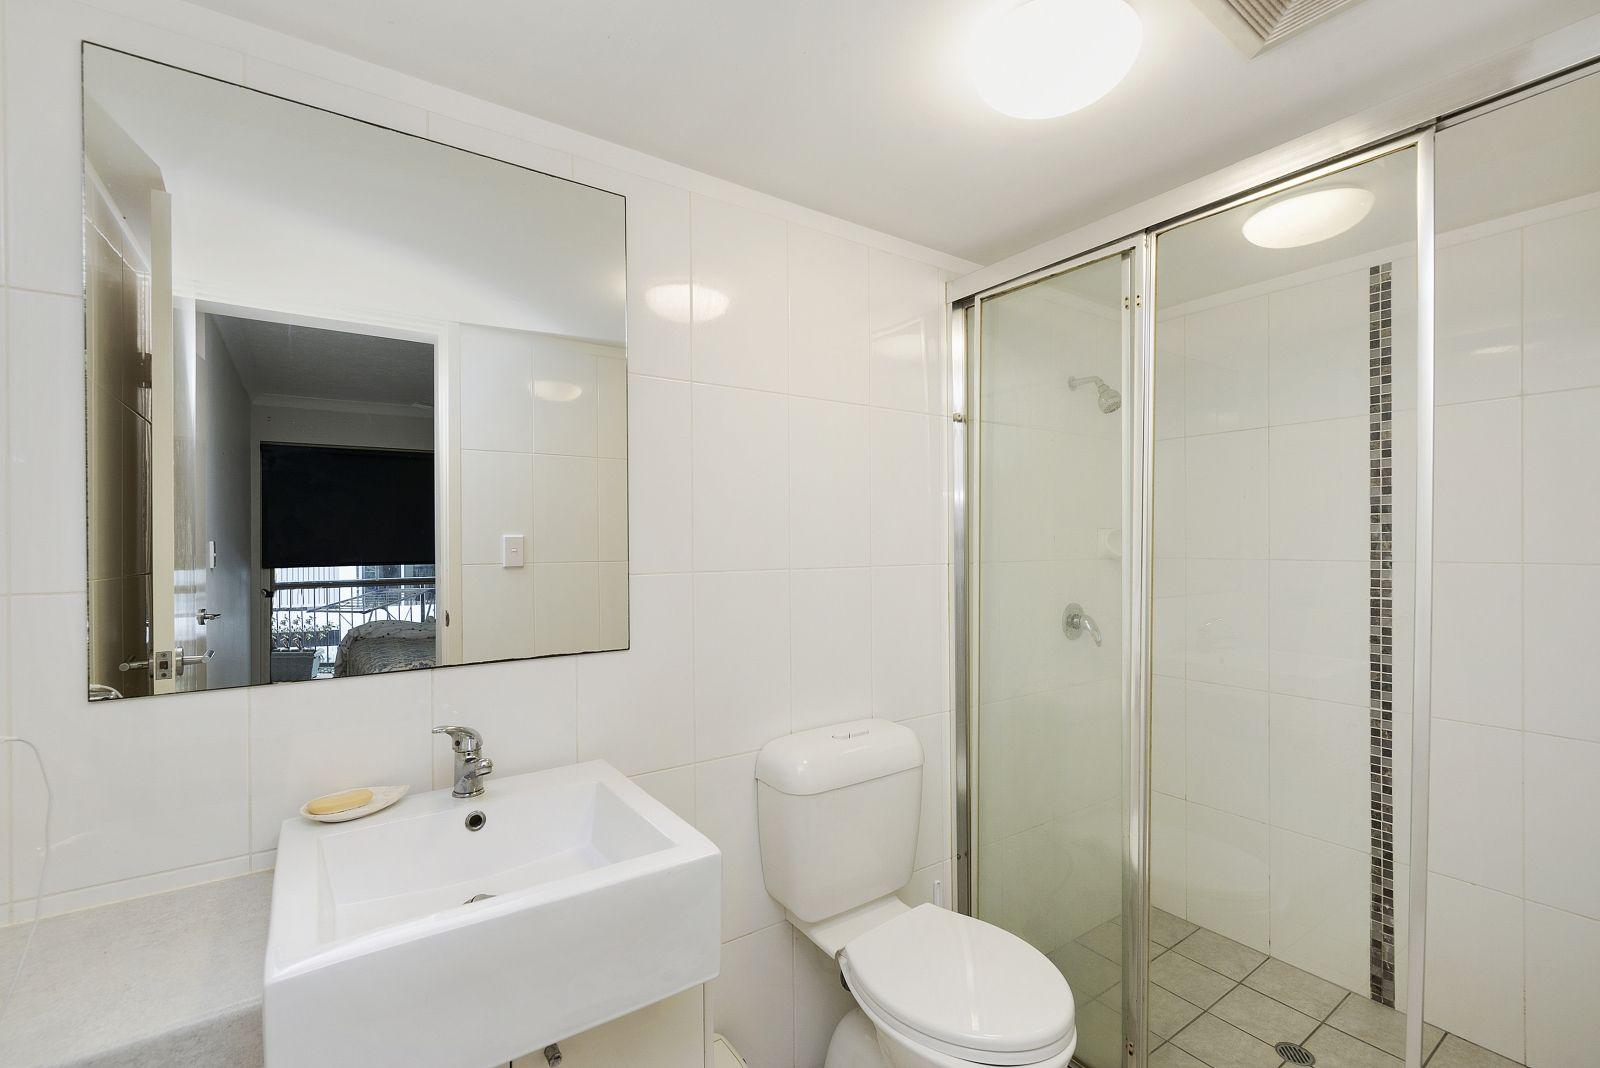 5/8 Bunton Street, Scarborough QLD 4020, Image 2